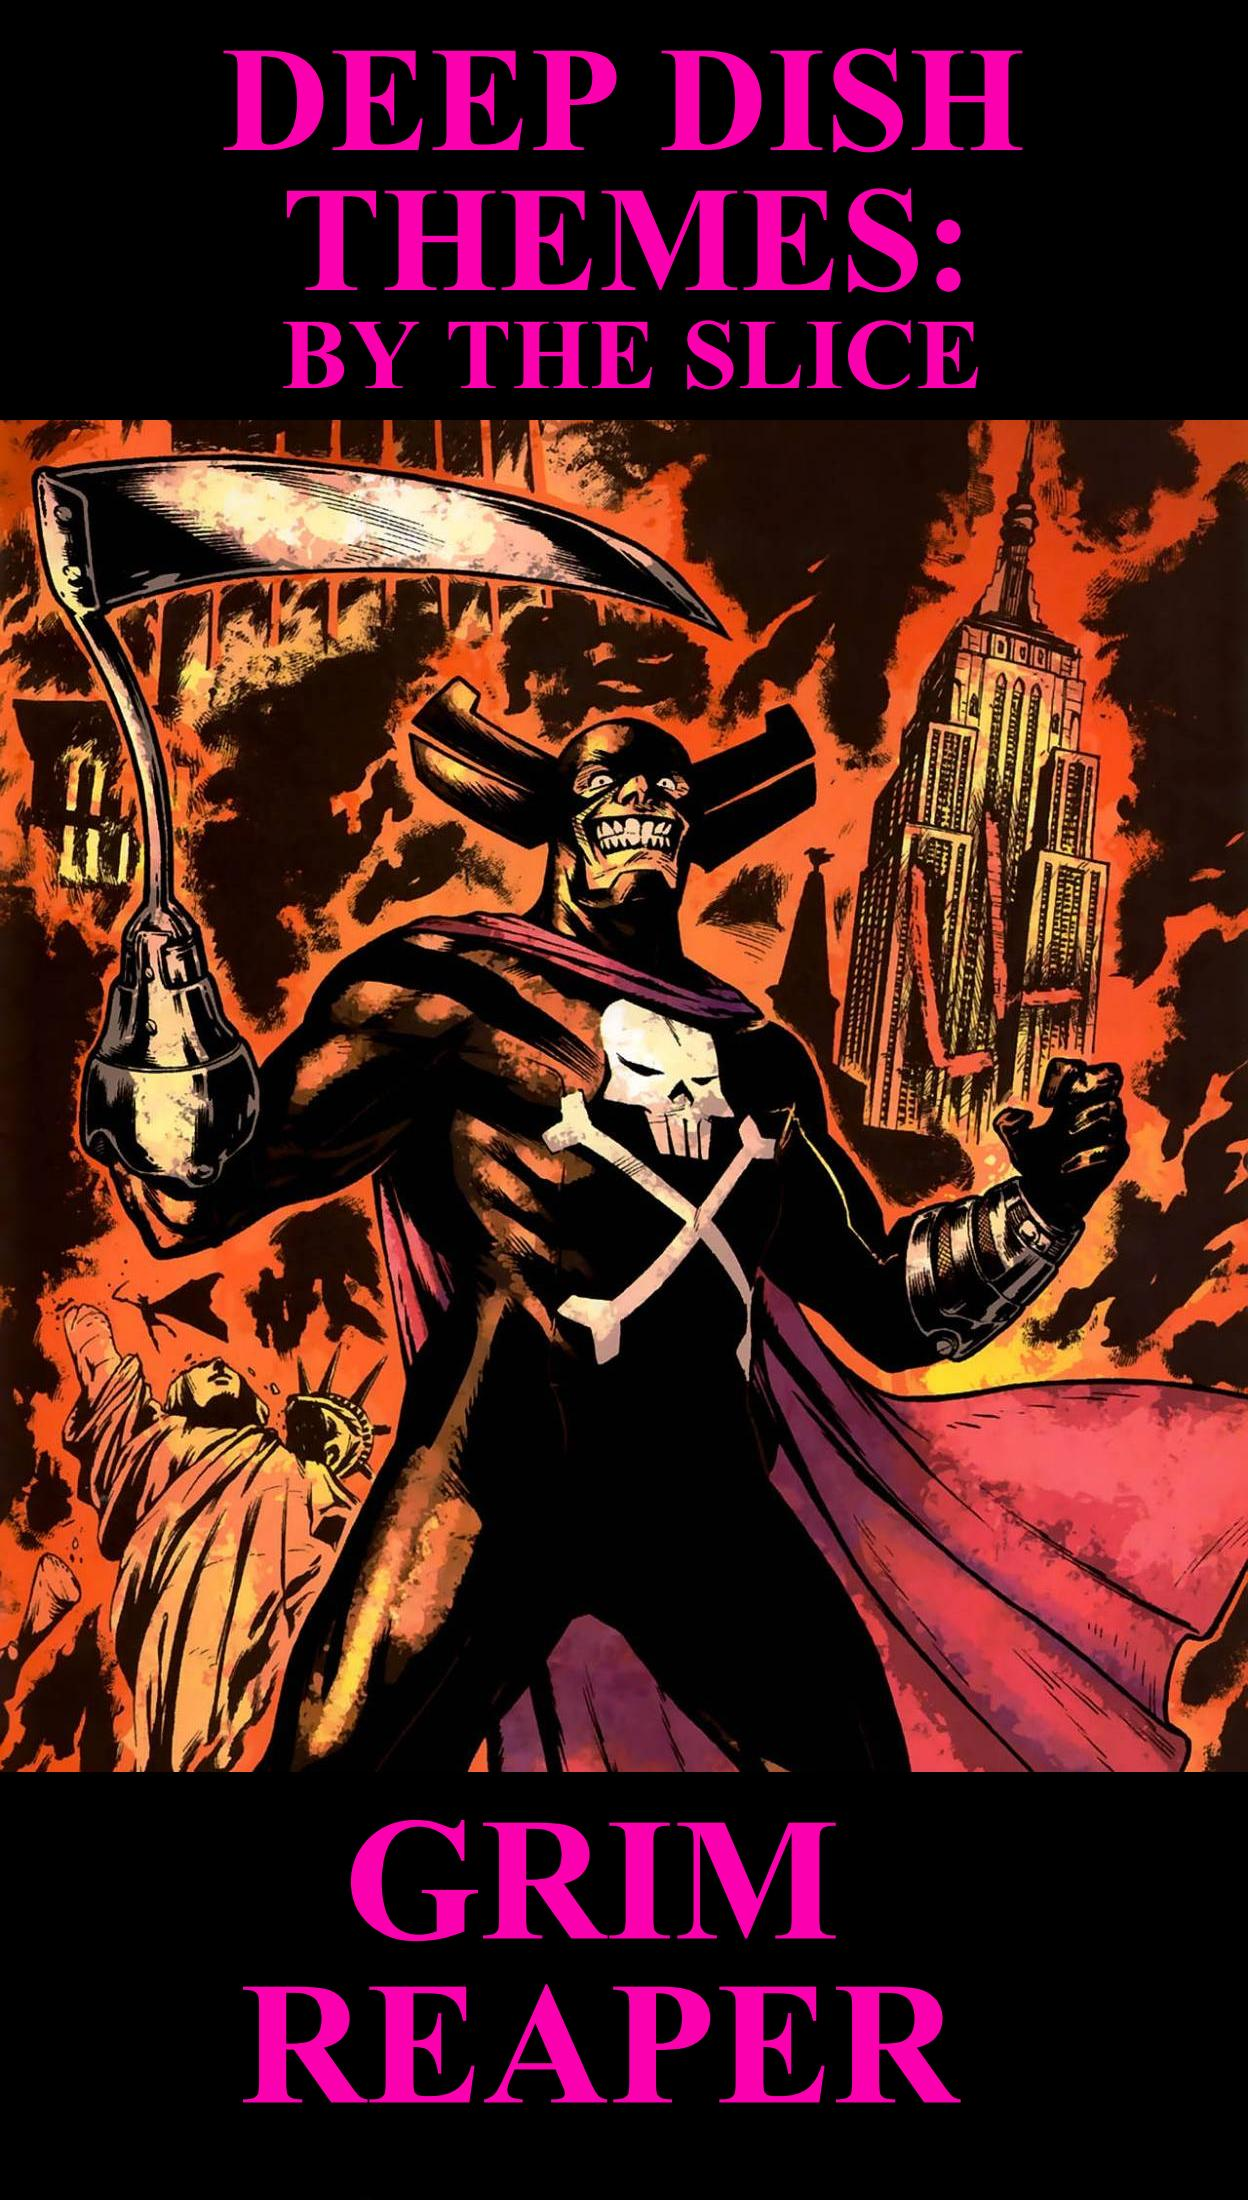 Deep Dish Themes Grim Reaper - HeroClix Realms